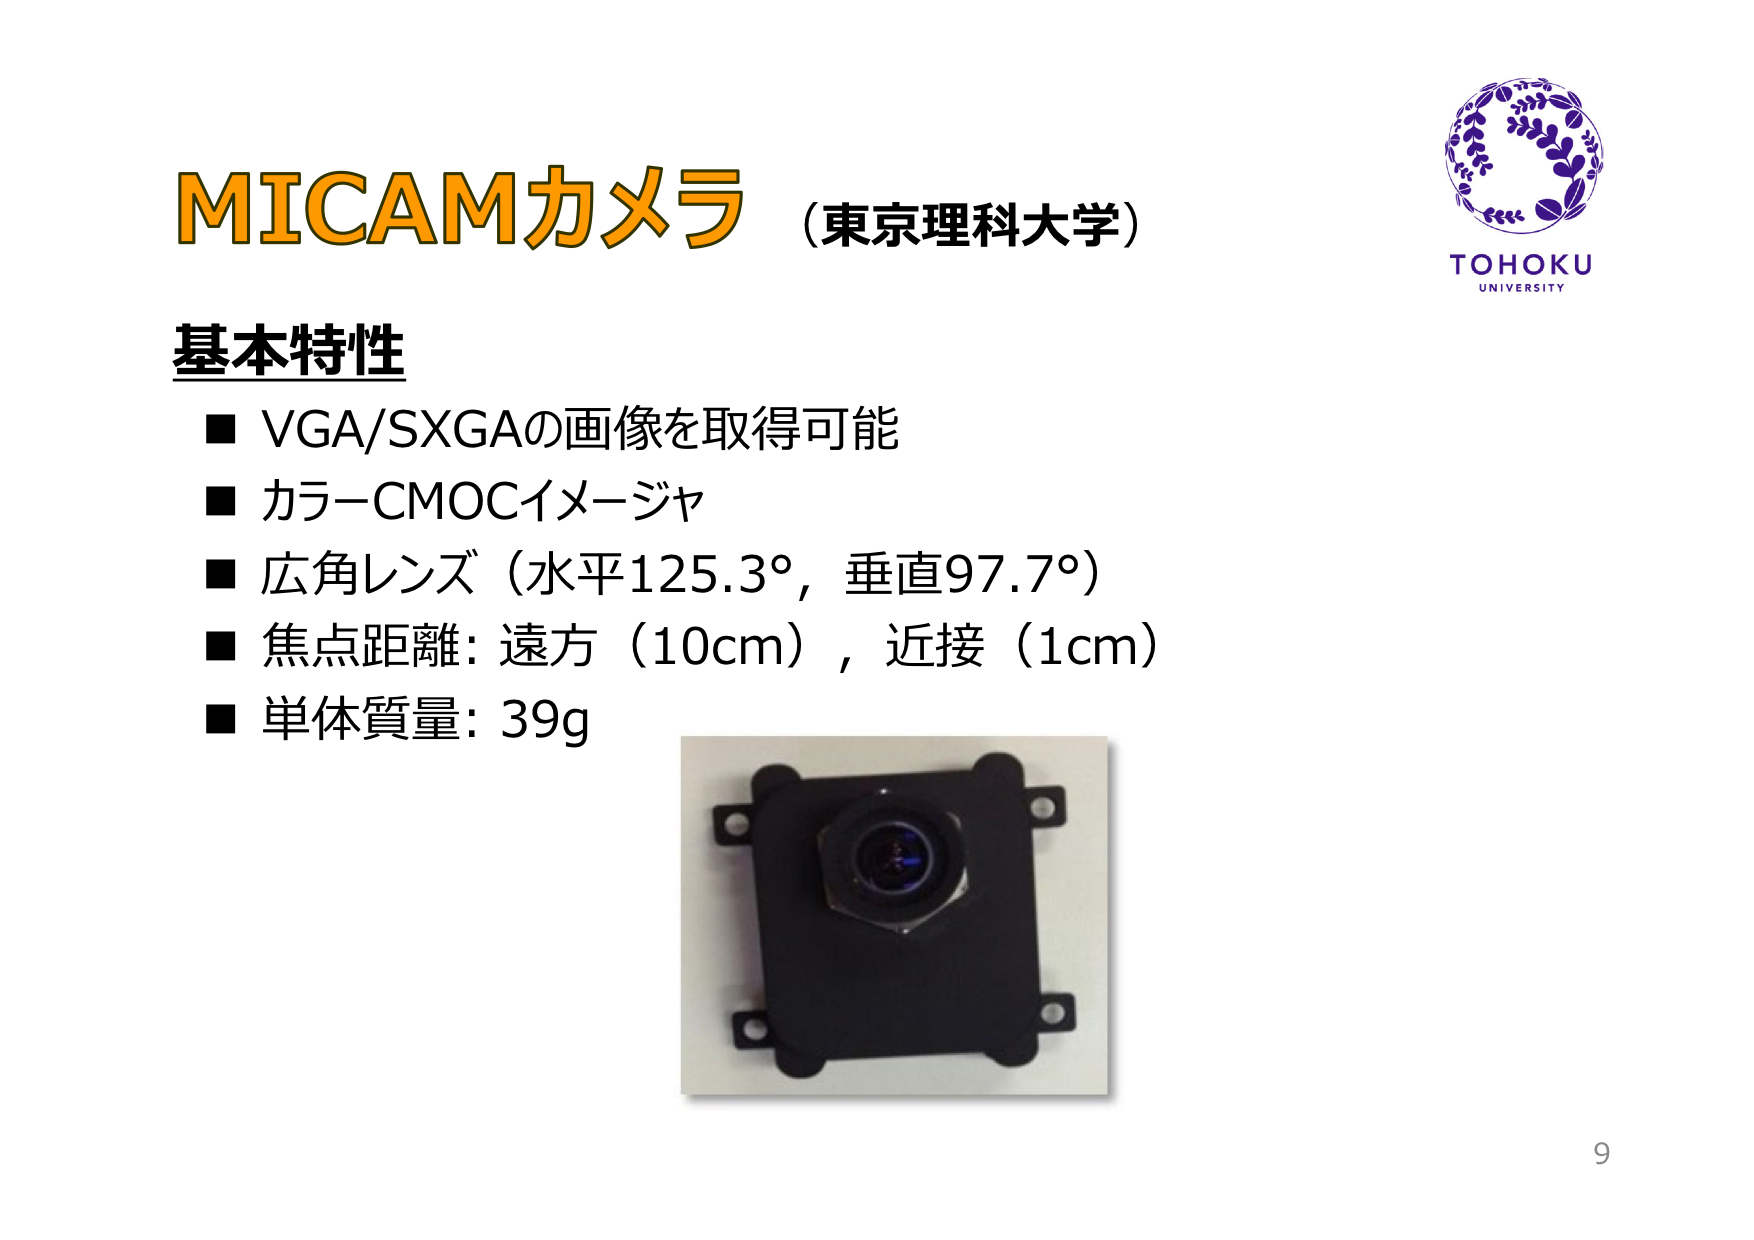 f:id:Imamura:20190924122730p:plain